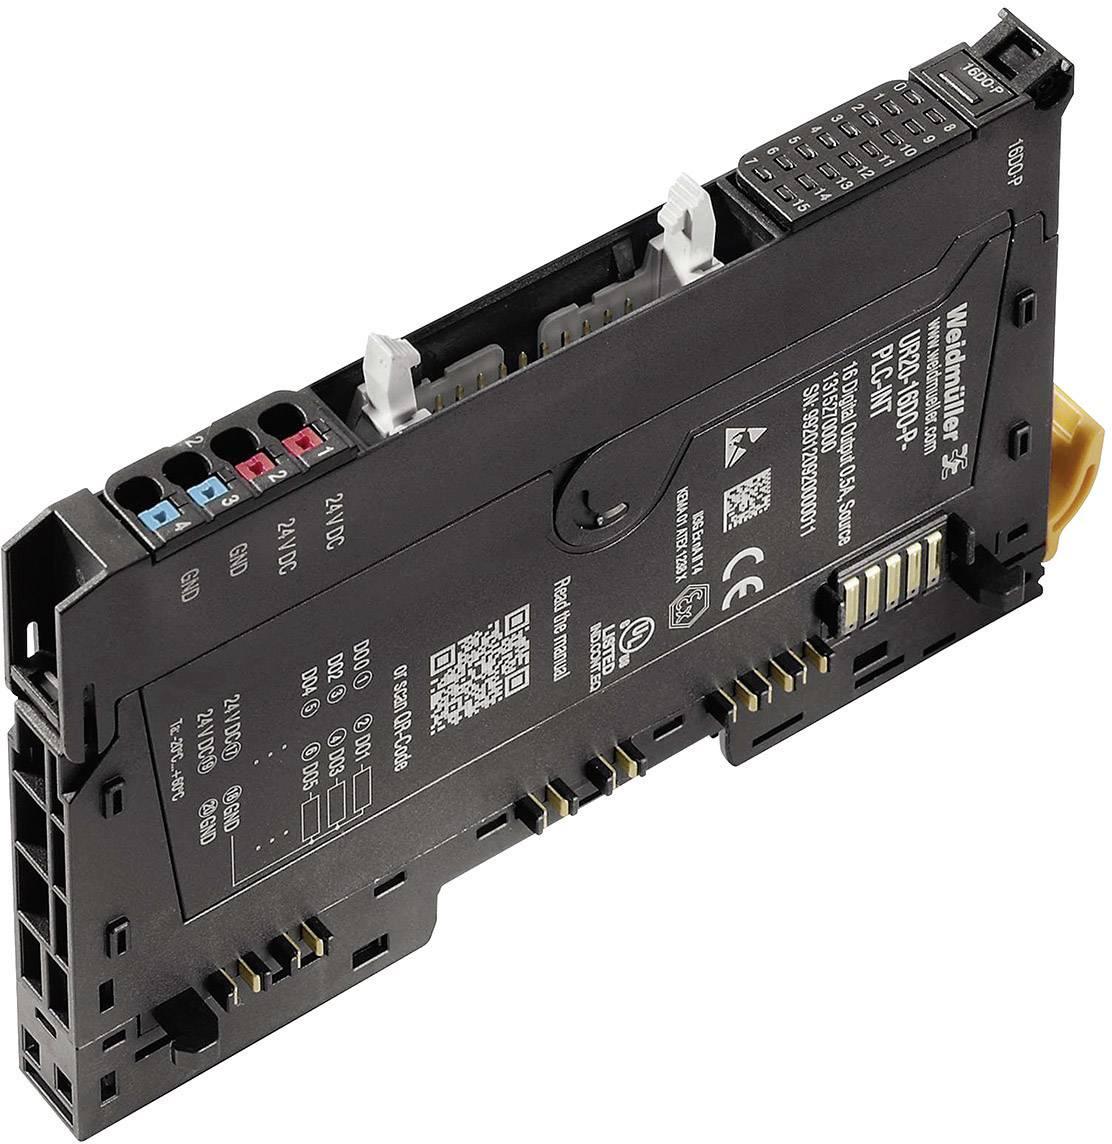 Rozšiřující modul pro PLC Weidmüller UR20-16DO-P-PLC-INT, 1315270000